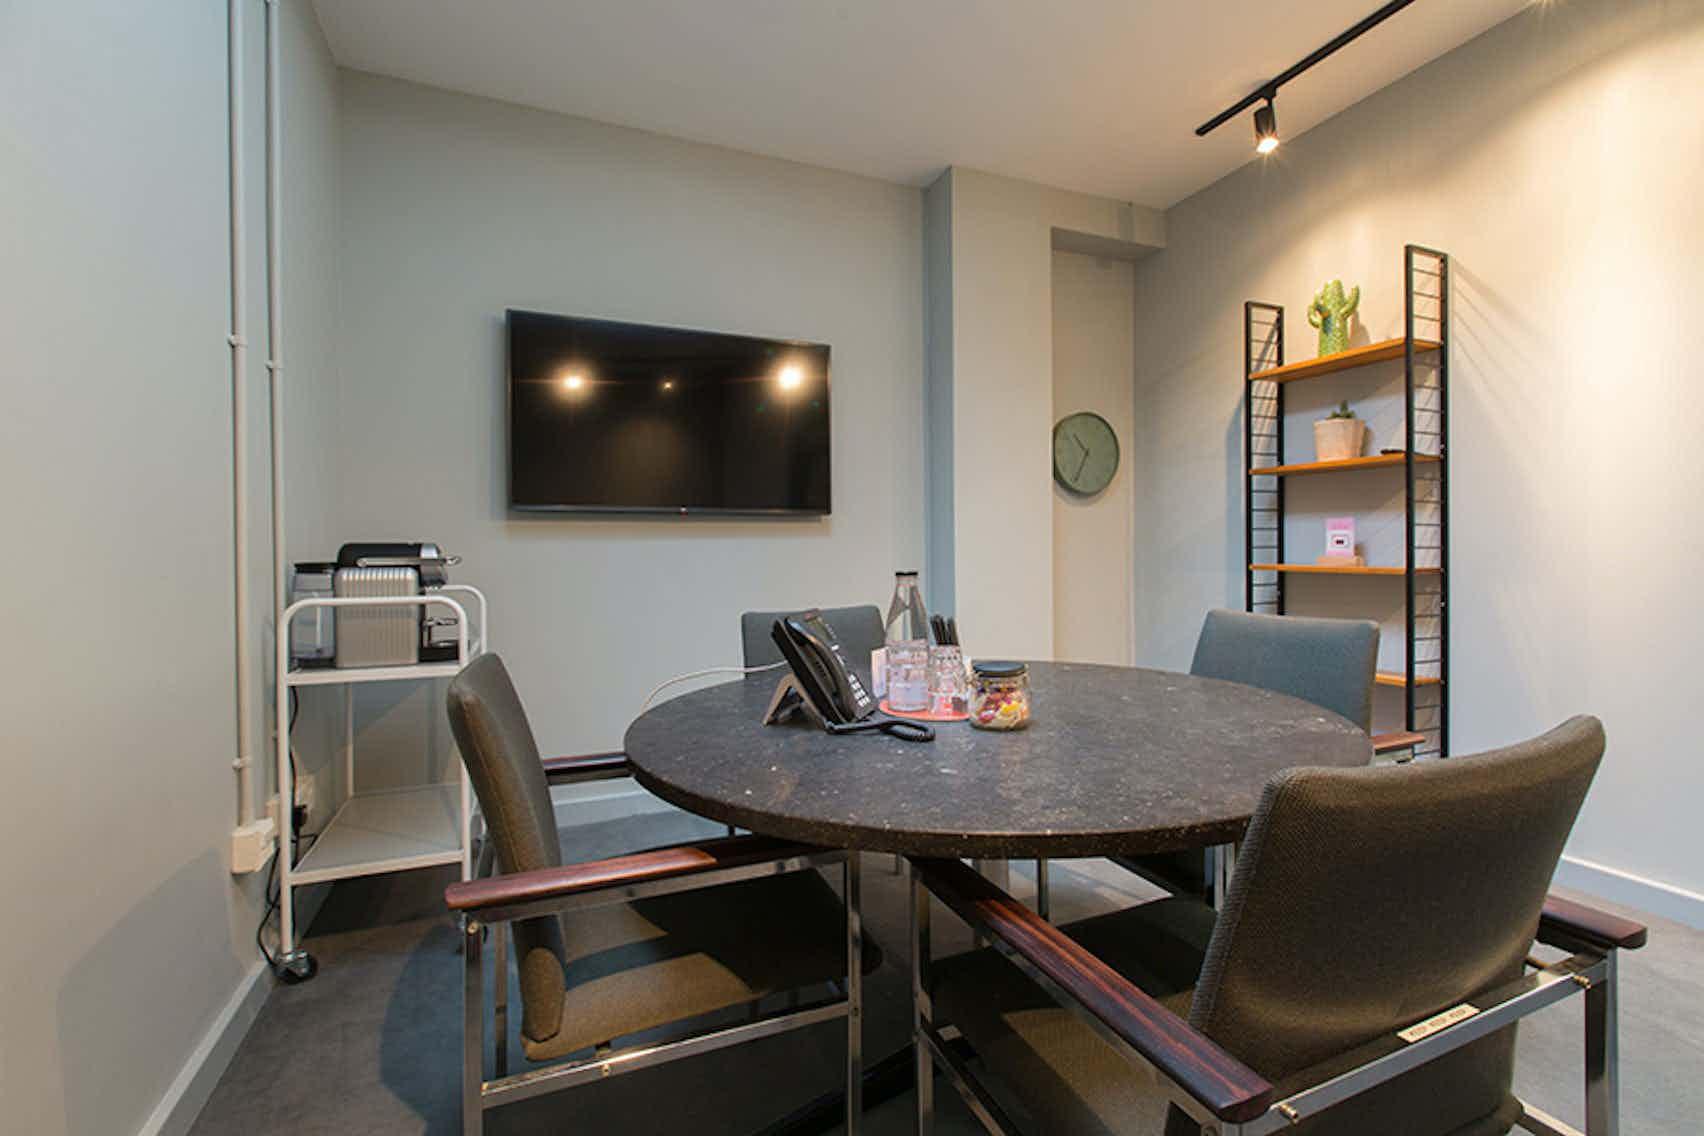 Meeting Room 6, TOG, 91 Wimpole Street